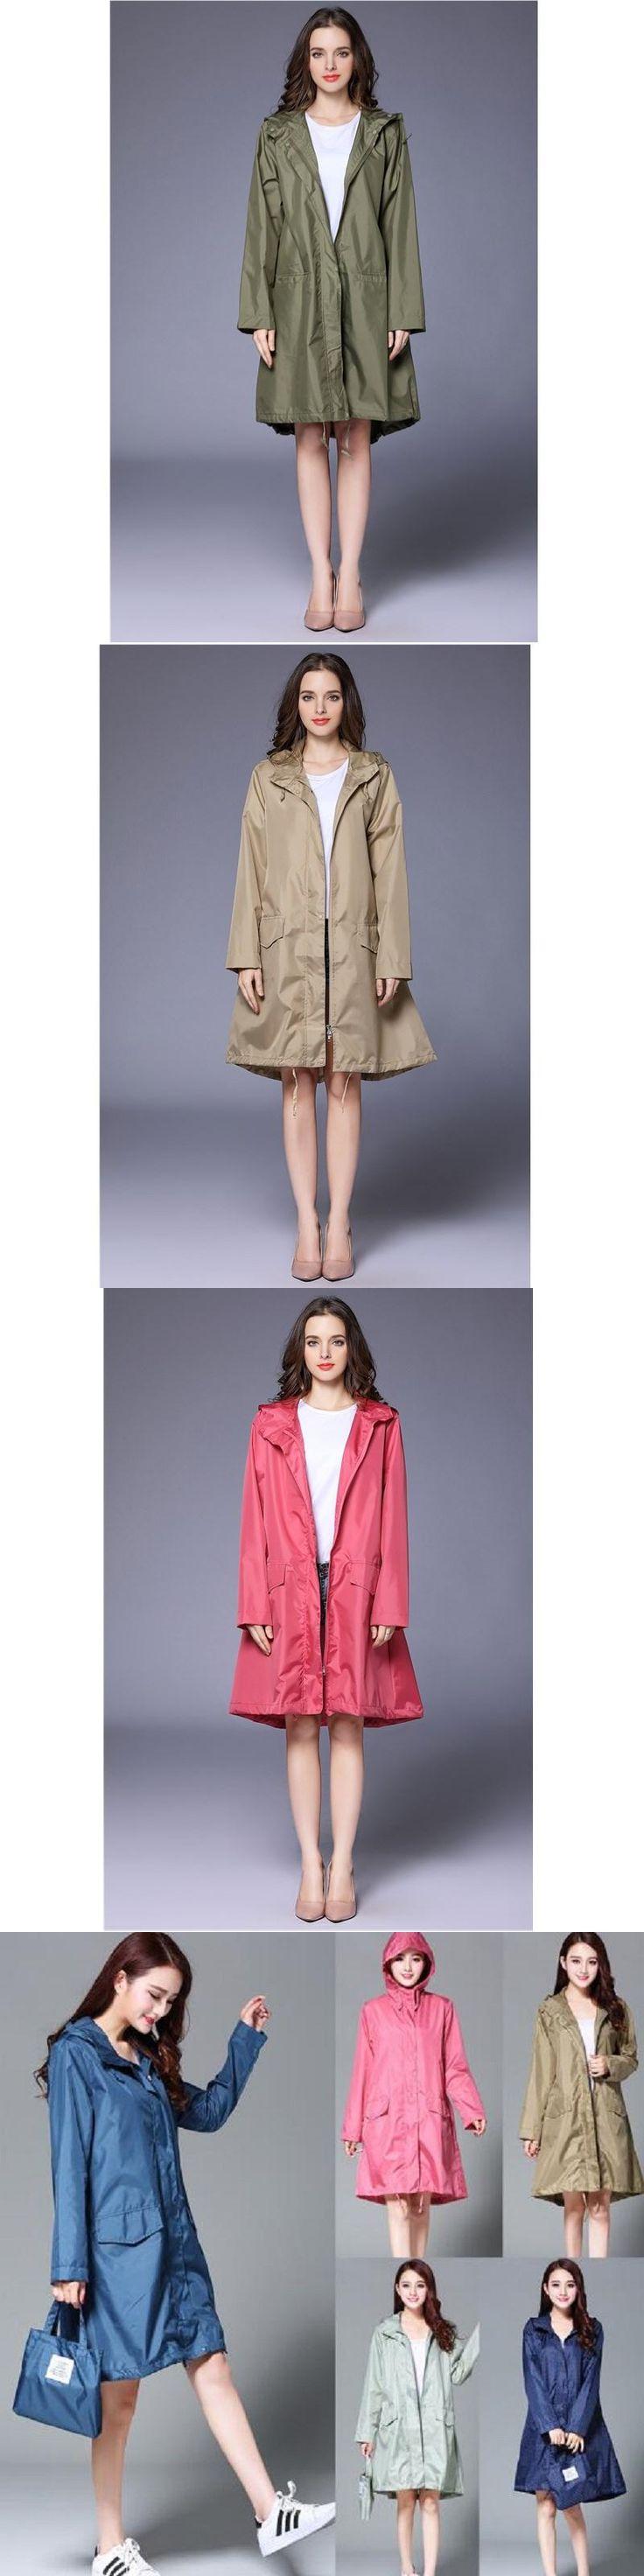 WINSTBROK Raincoat Women 2017 Fashion Ladies Rain Coat Breathable Ladies Long Raincoats Portable Water-Repellent Raincoat Women